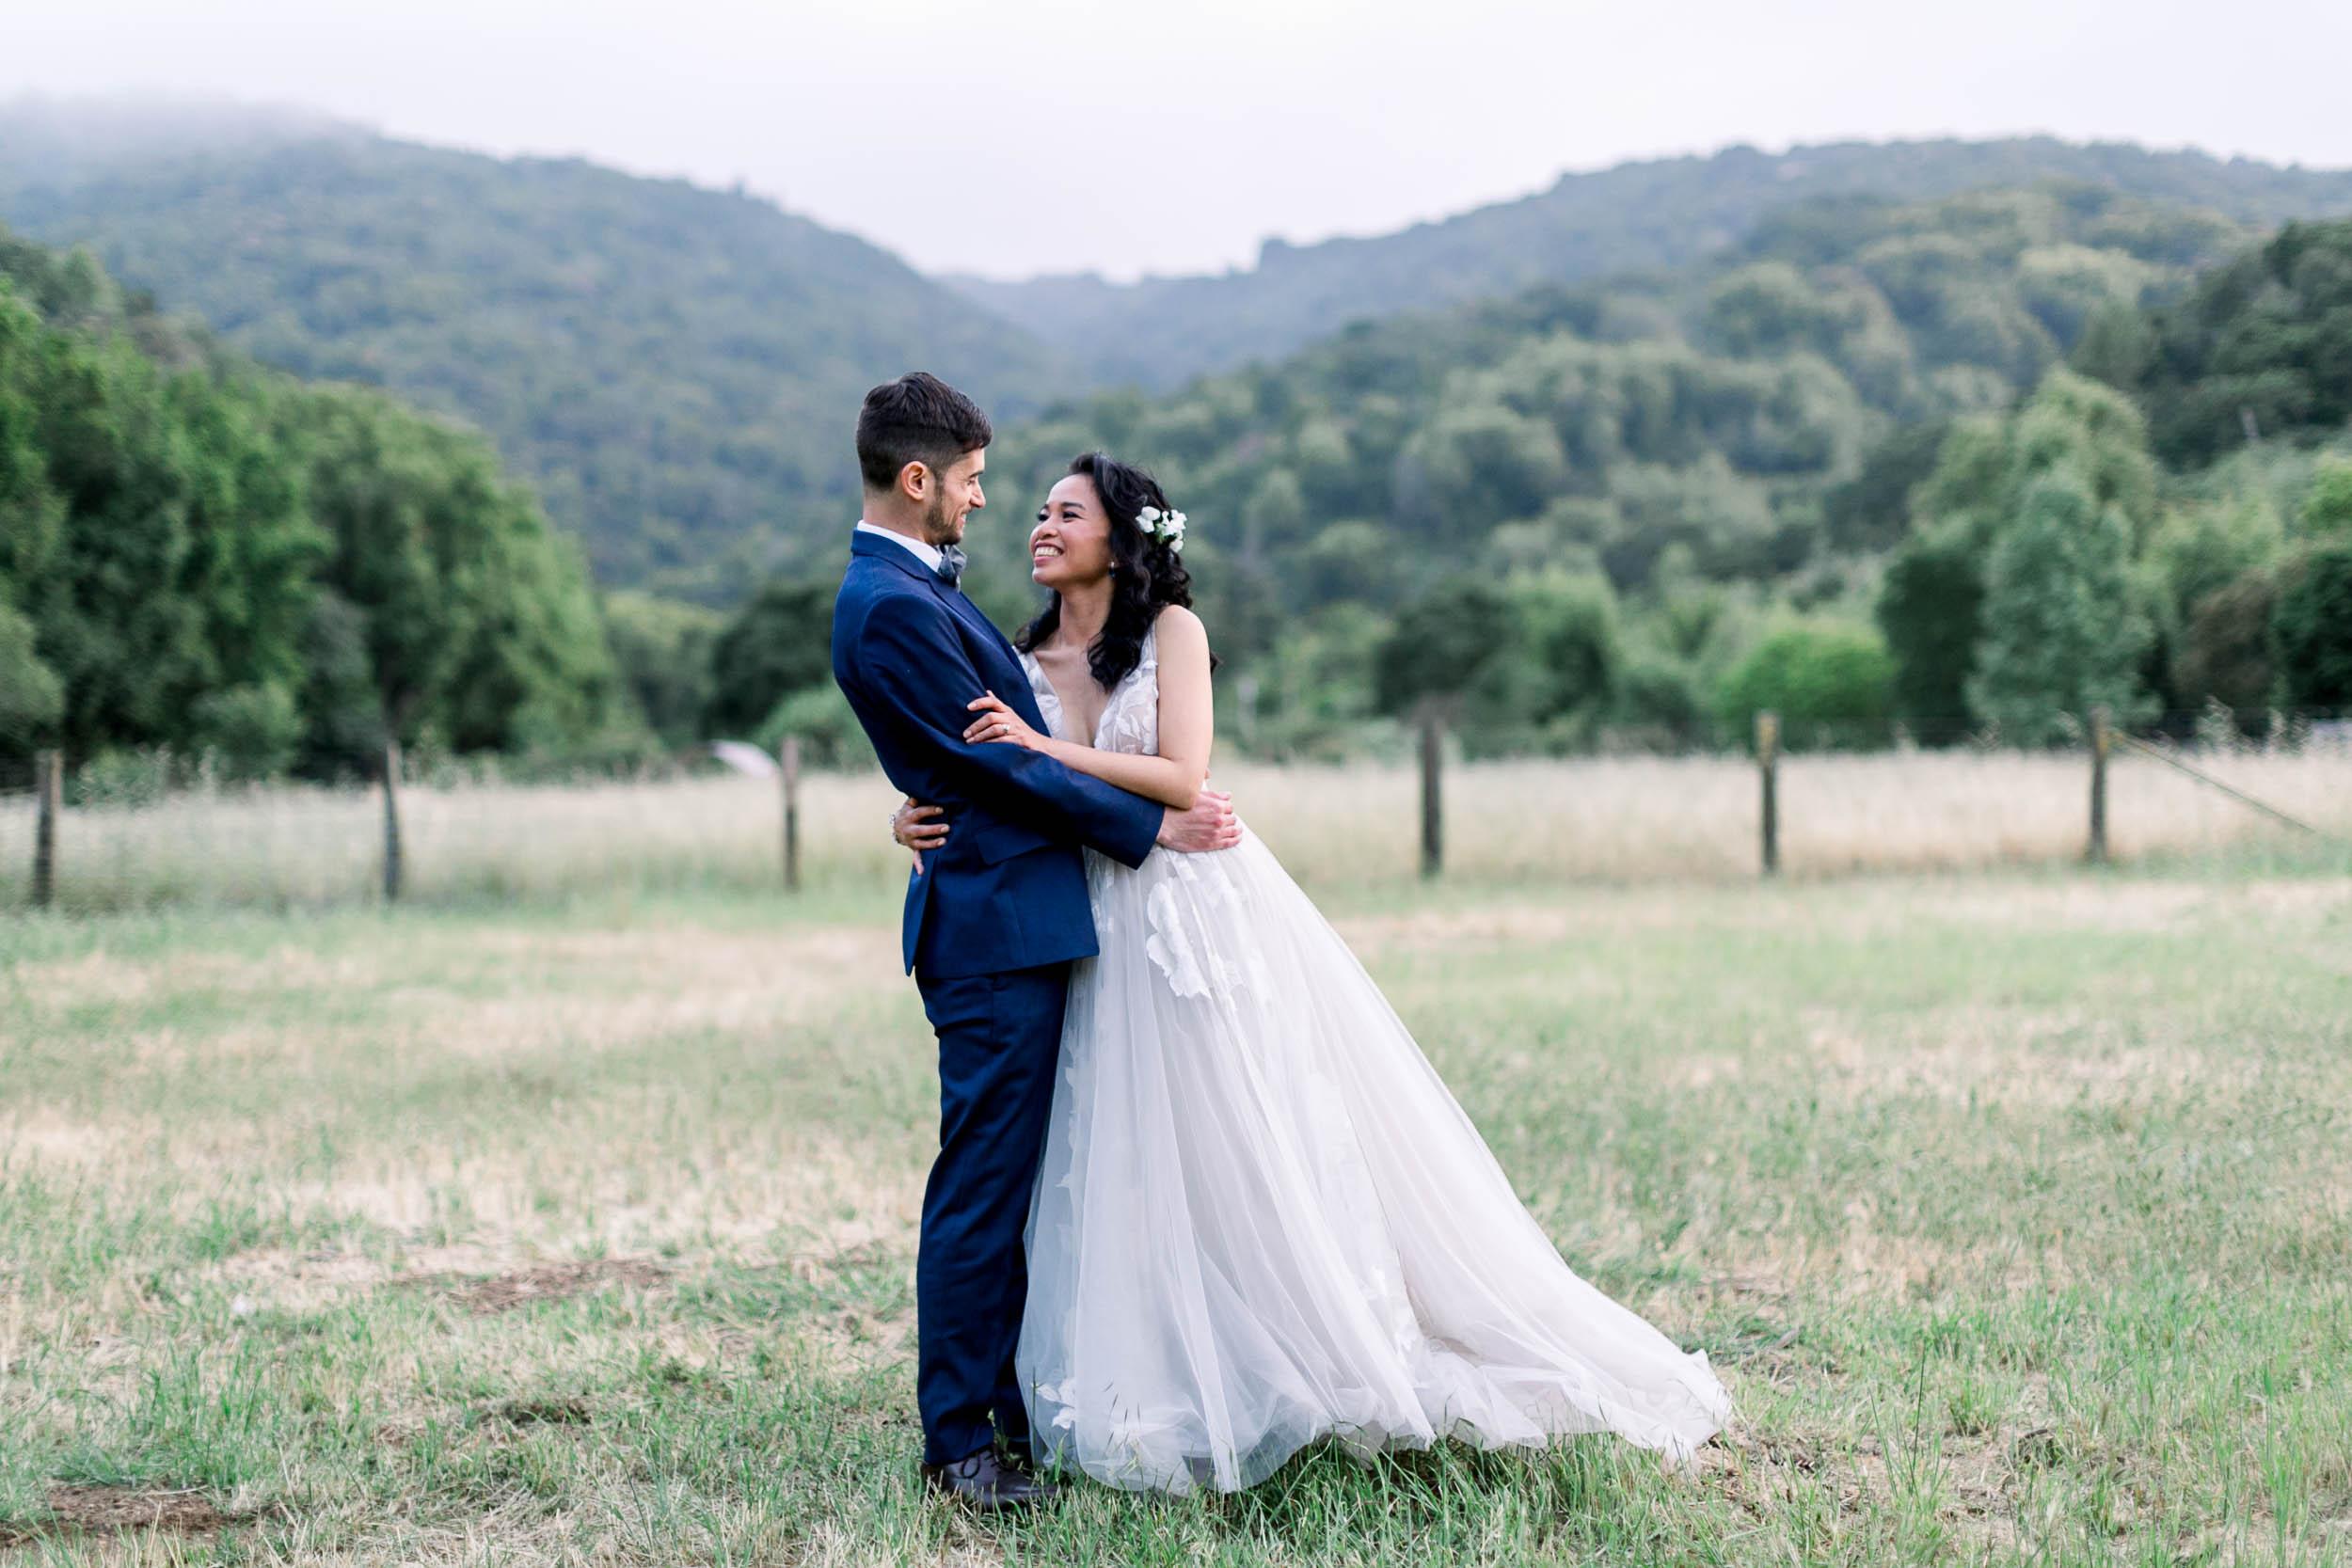 052519_B+S_Hidden Villa Wedding_Buena Lane Photography_052519_1099CY.jpg